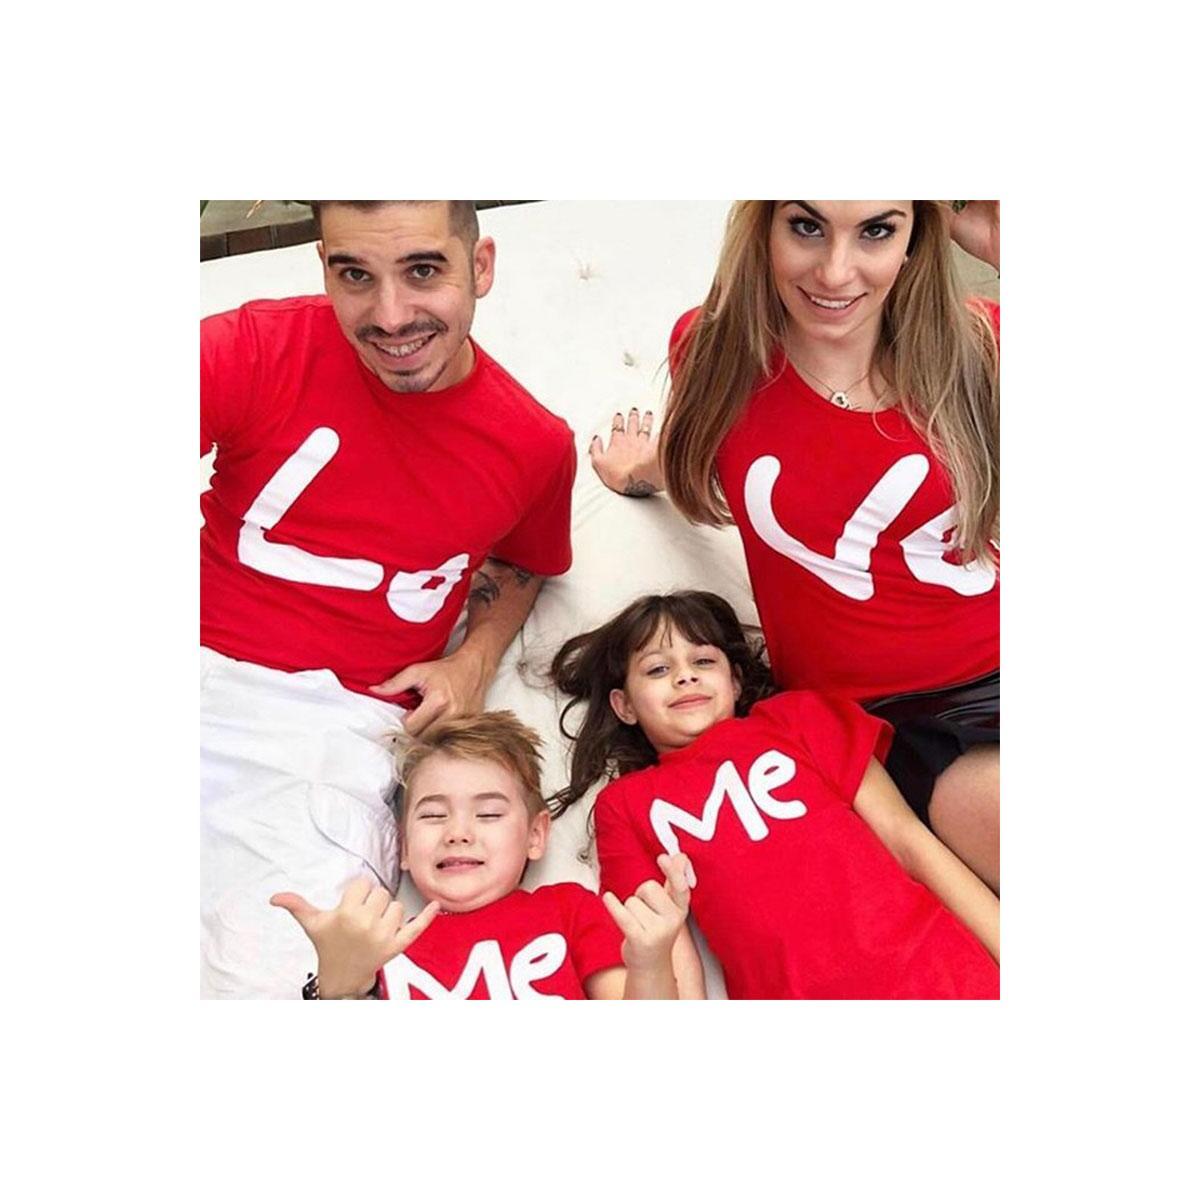 LOVE Matching Family Shirts, White Black / mother S (1PCS)